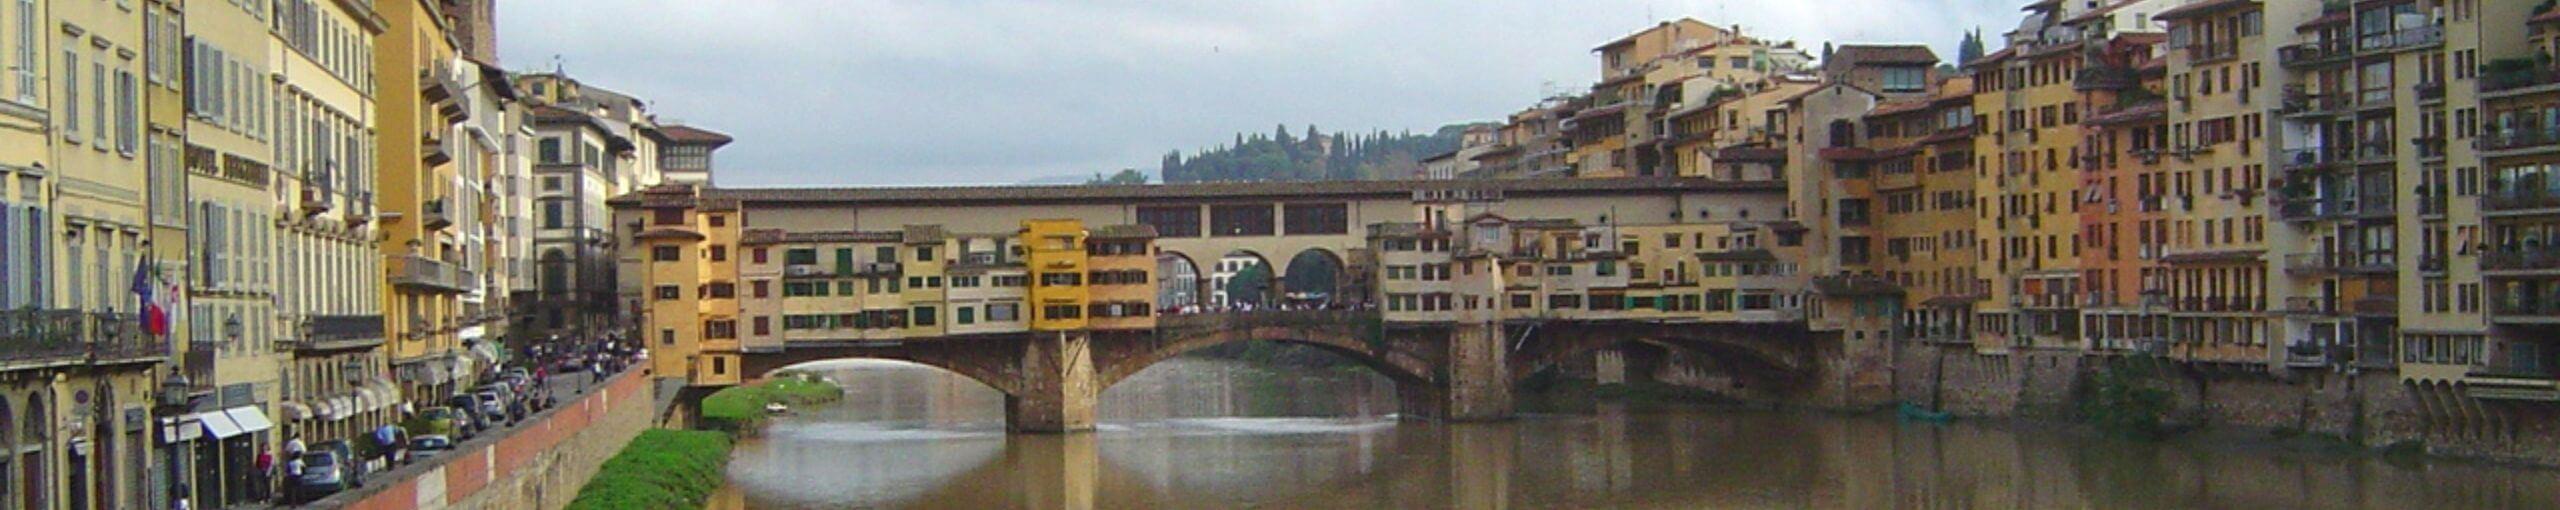 Puente Vecchio, Florencia. Toscana, Italia.